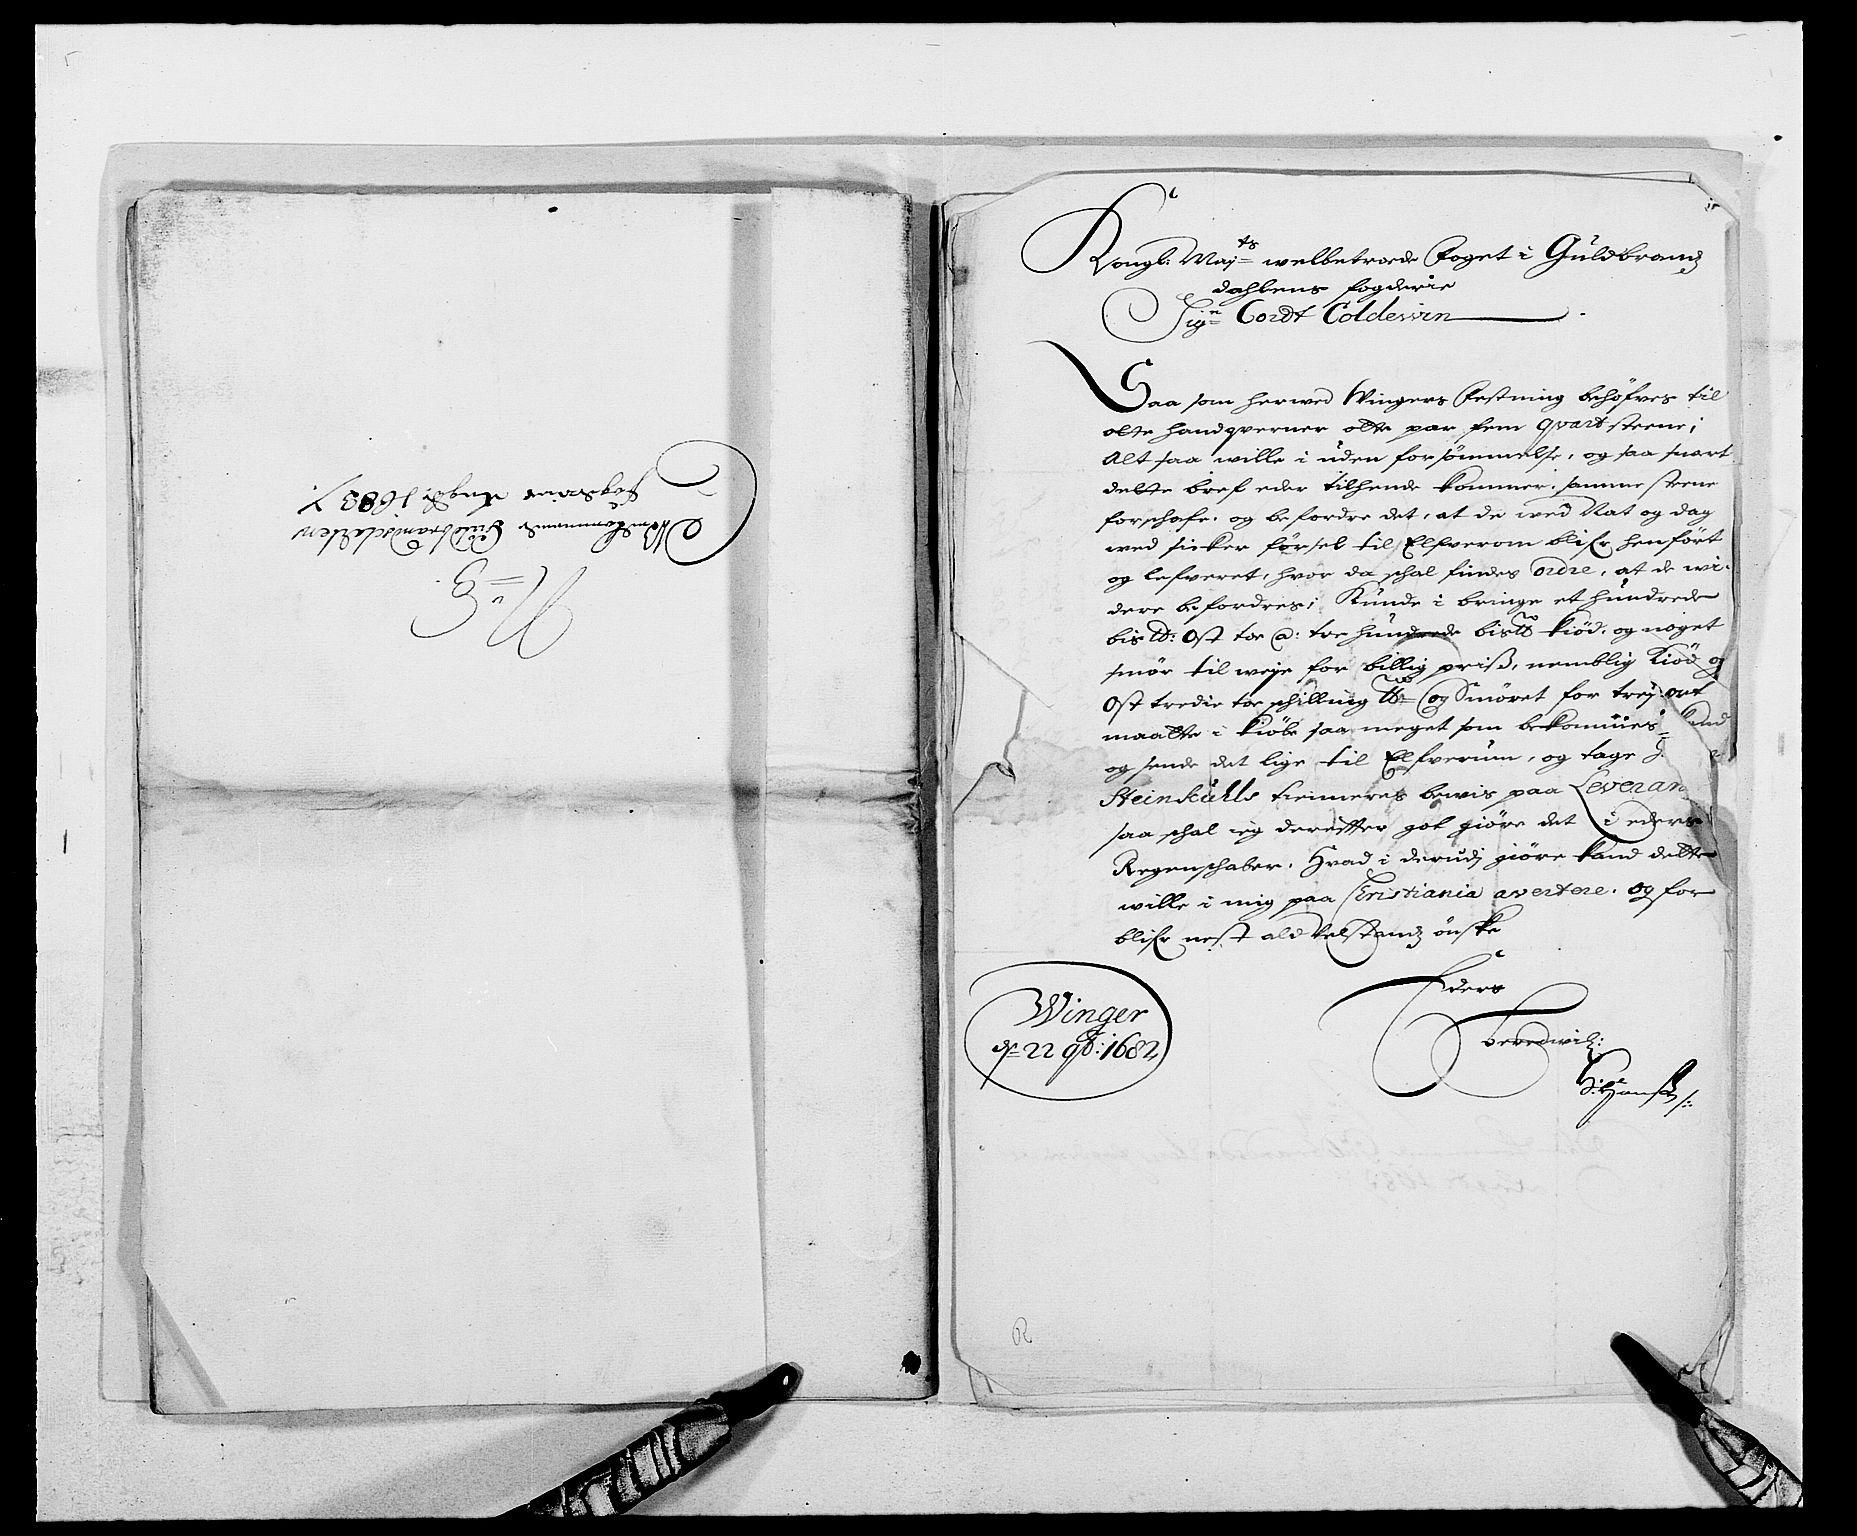 RA, Rentekammeret inntil 1814, Reviderte regnskaper, Fogderegnskap, R17/L1158: Fogderegnskap Gudbrandsdal, 1682-1689, s. 313